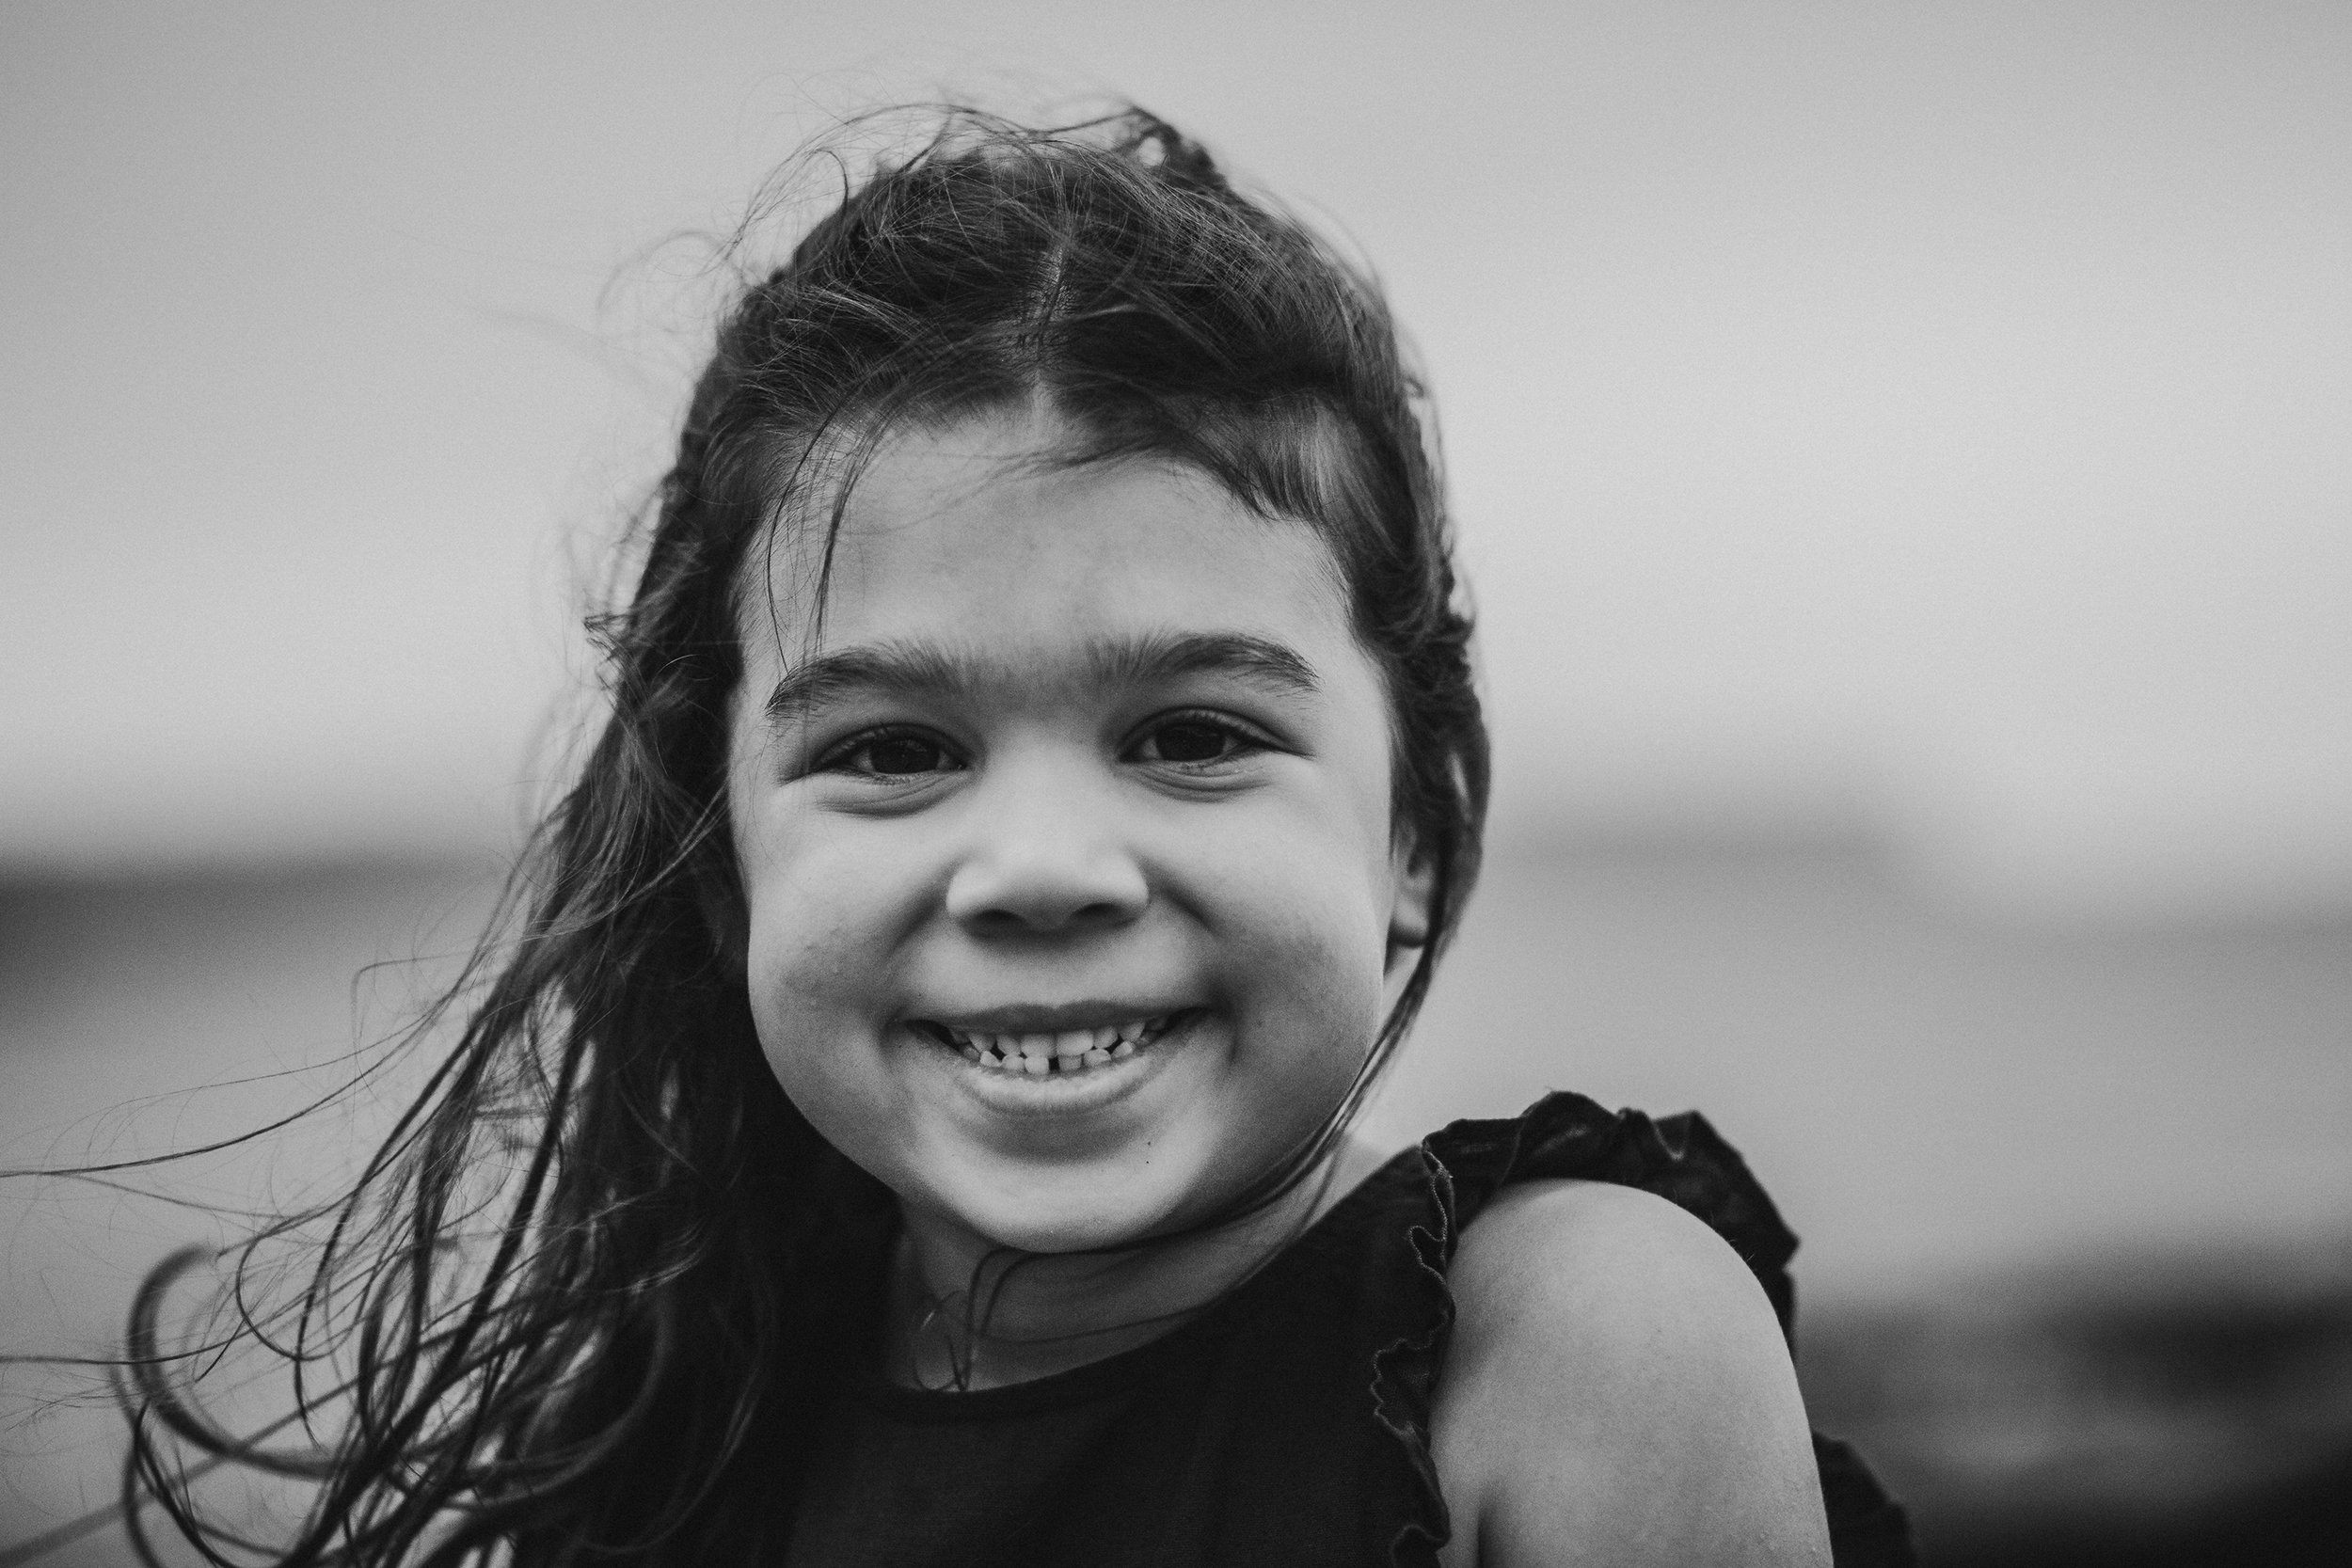 Sydney portrait photographer